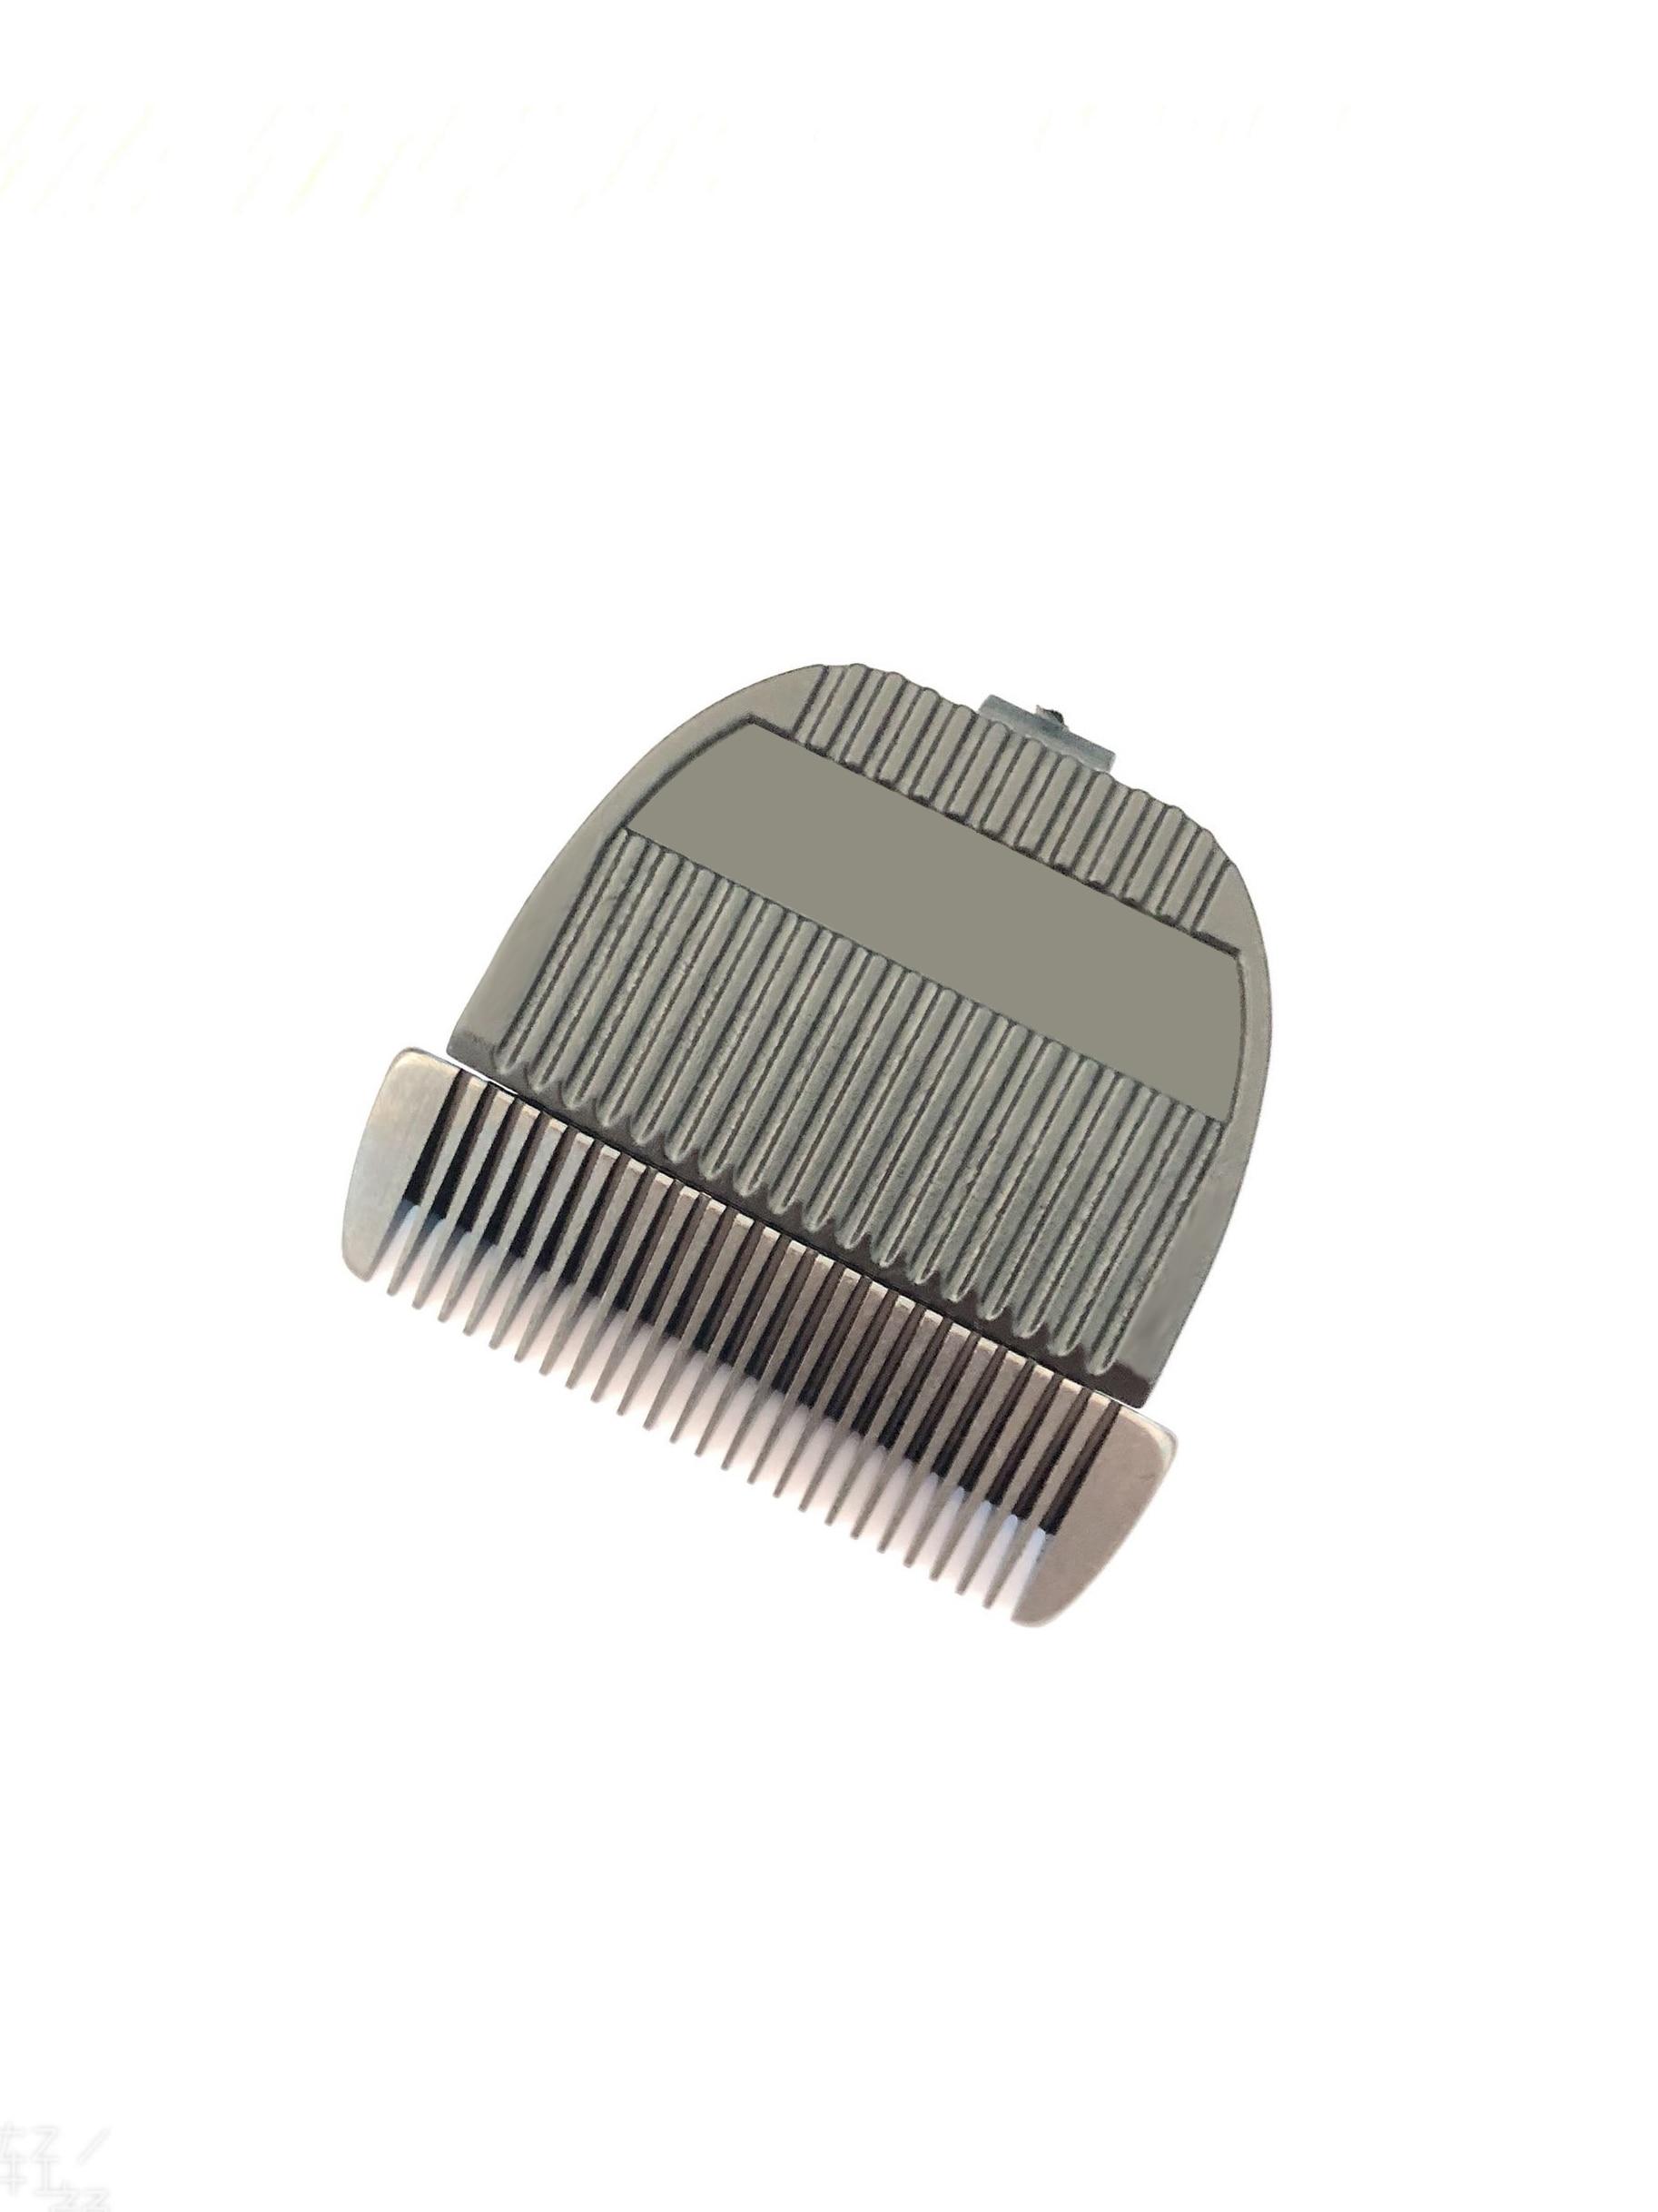 Hair Trimmer Cutter Barber Head For Panasonic  ER150 ER151 ER152 ER153 ER154 ER160 ER1510 ER1511 ER1610 ER1611 ER-GP80 ER9900